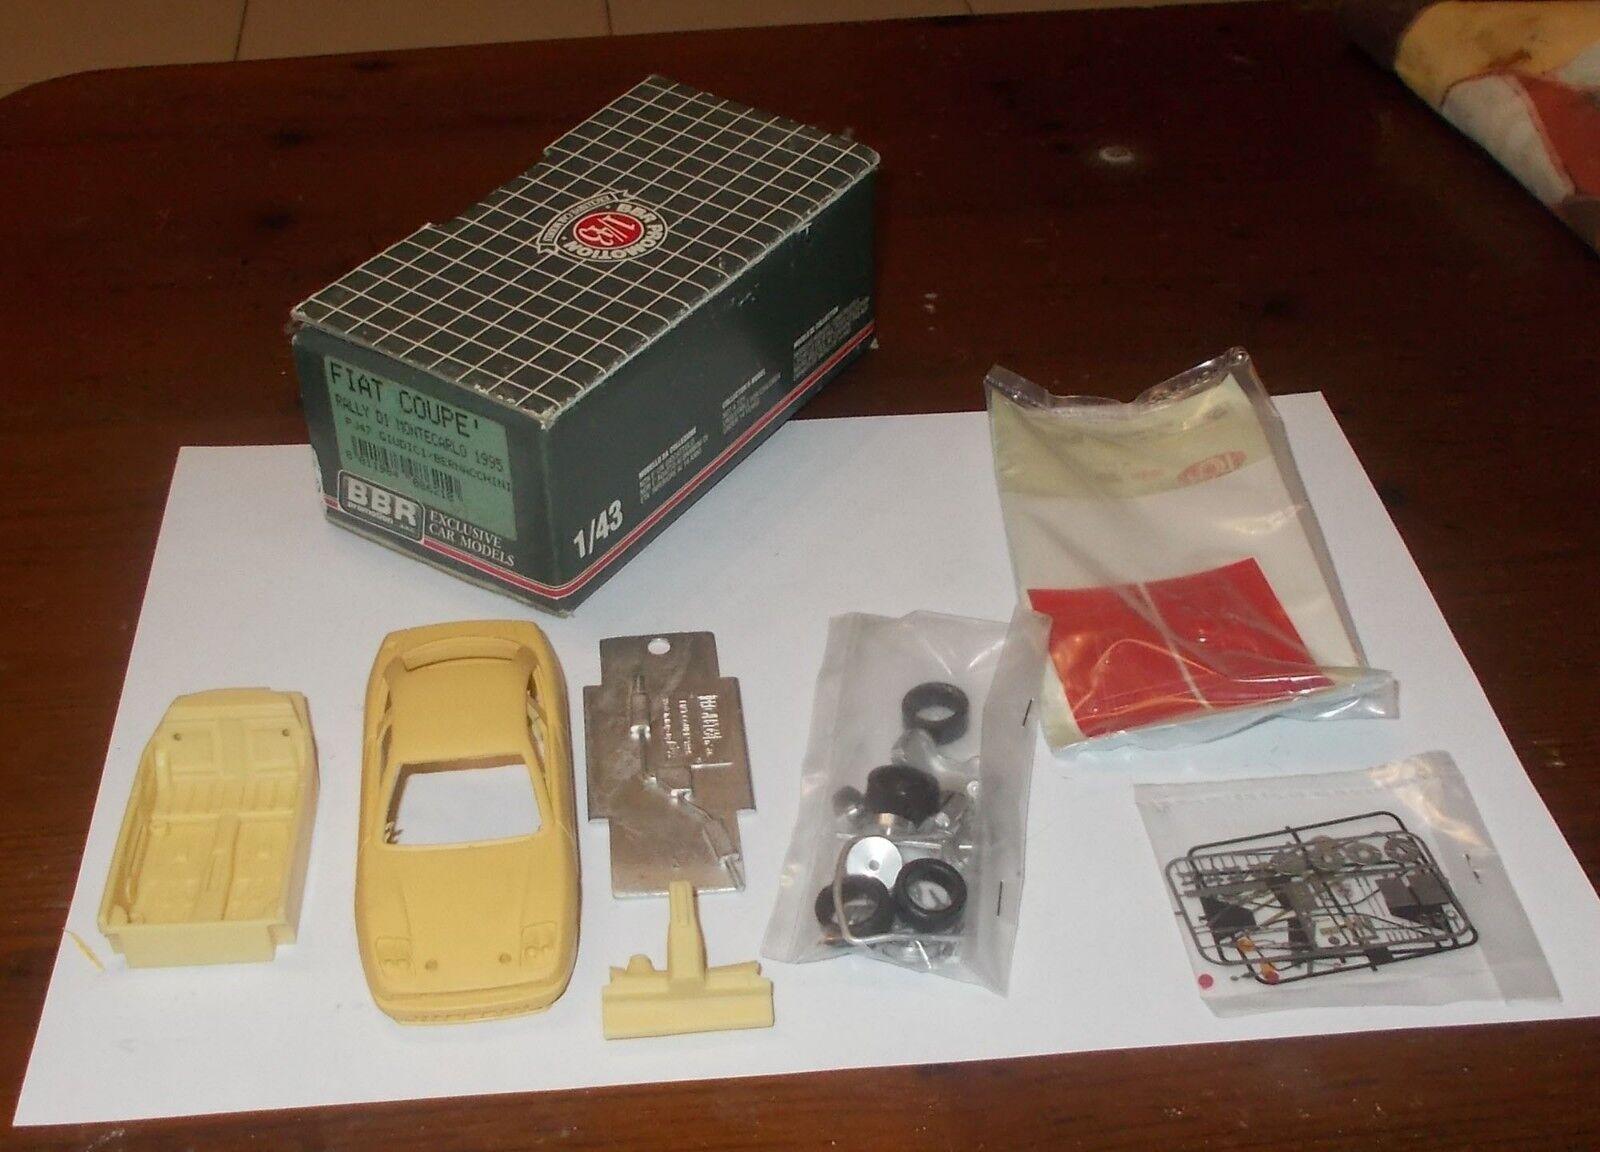 Modell - auto bbr förderung fiat coupé  rally di montecarlo 1995 1 43 meri kits.